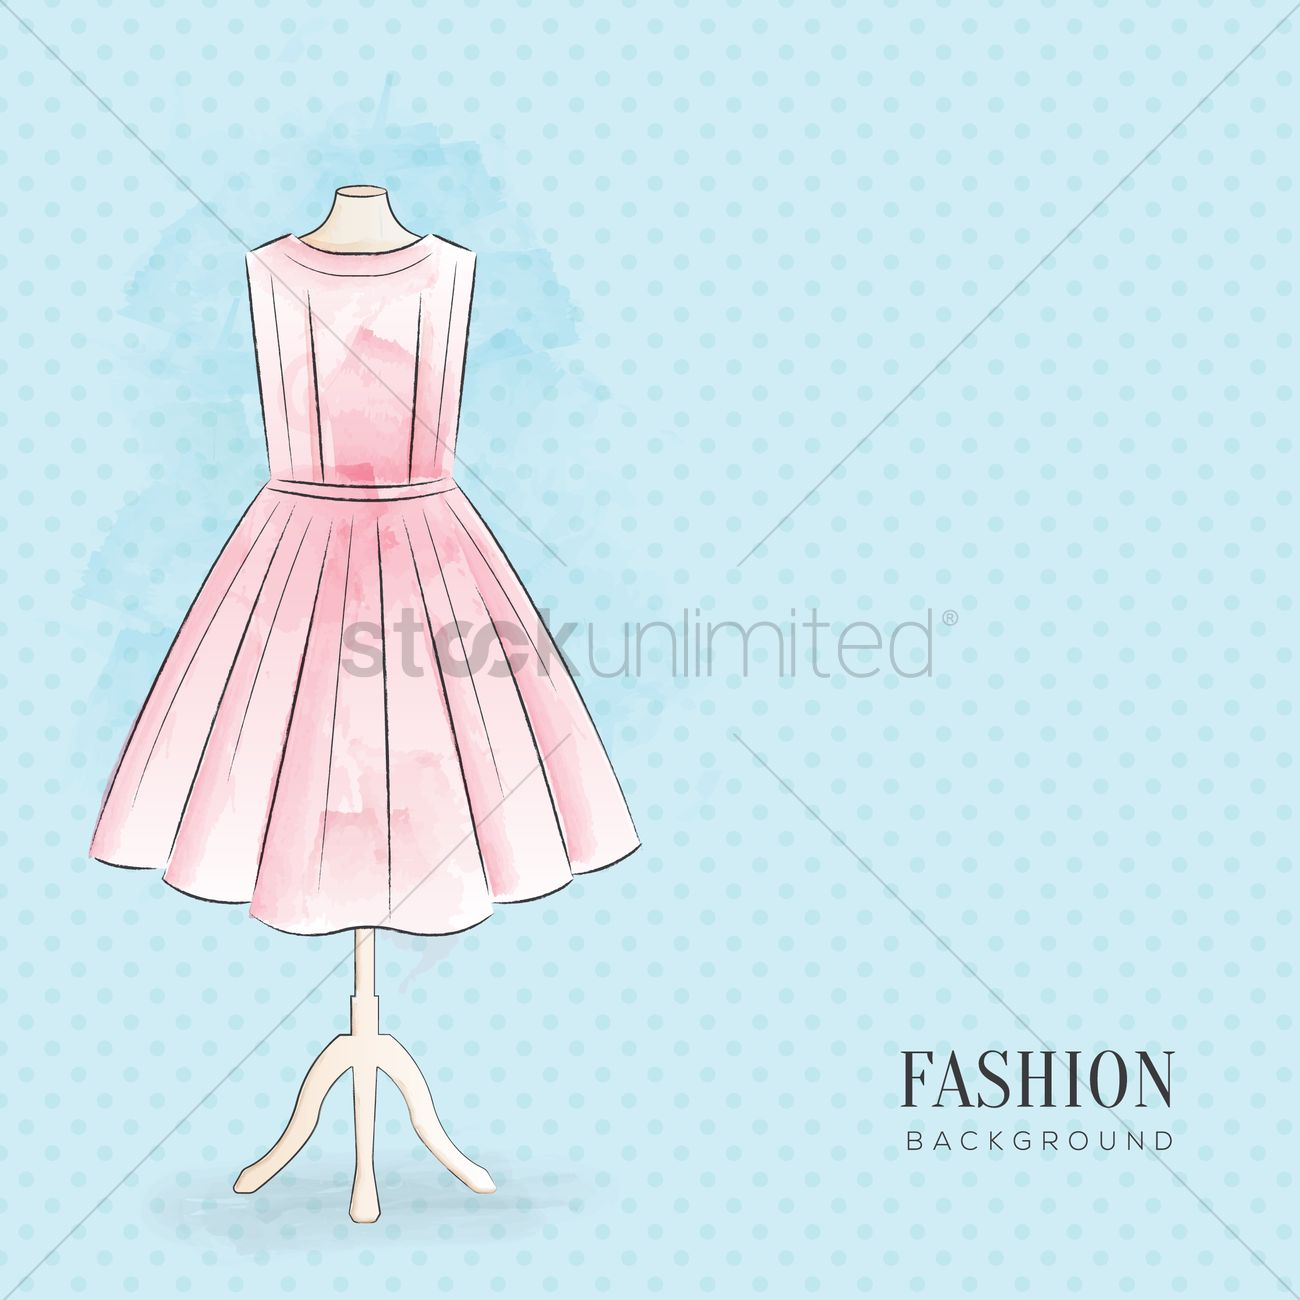 Fashion Background Design Vector Image 1973278 Stockunlimited